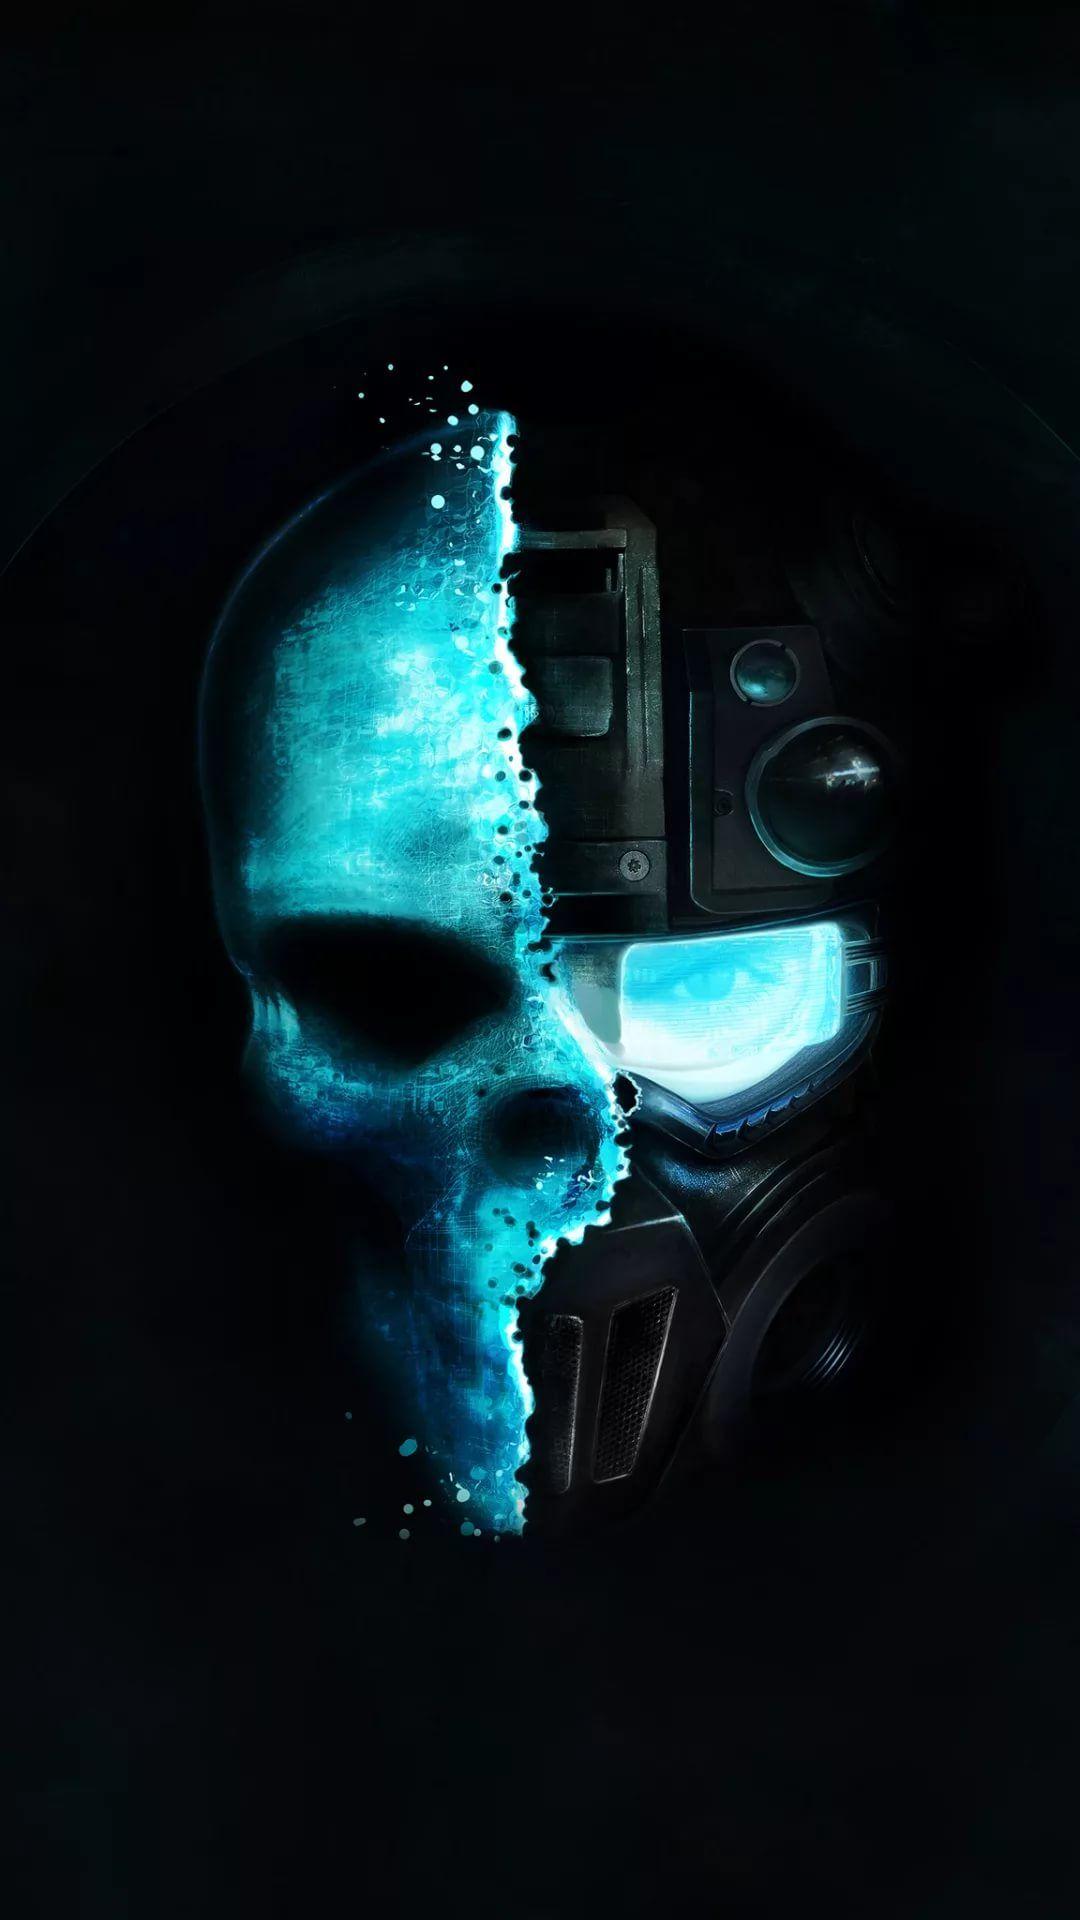 Cool Skull phone wallpaper hd